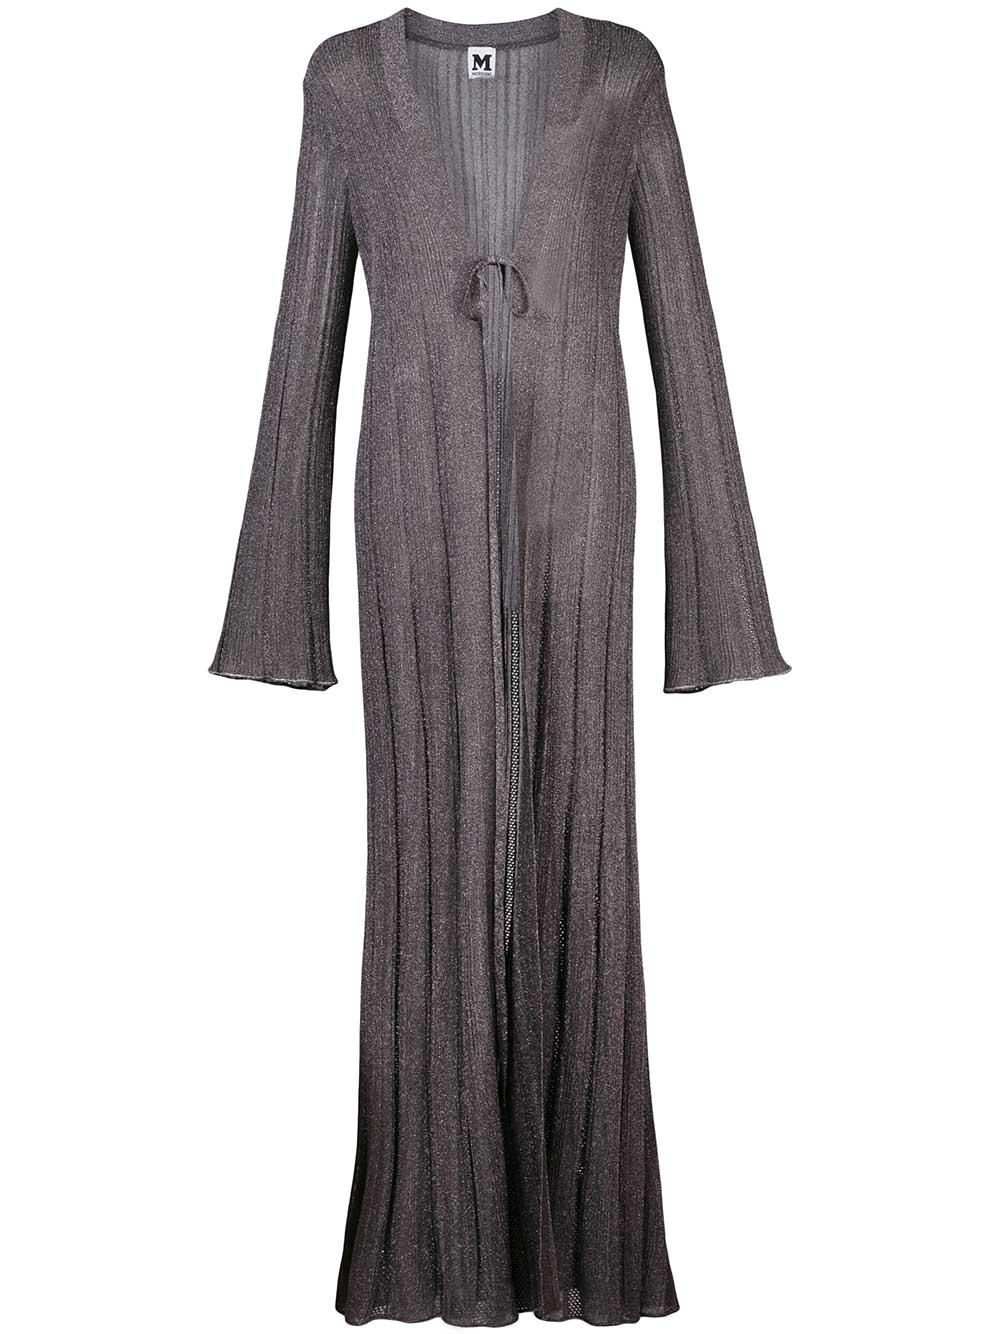 Long Sleeve Lurex Long Cardigan Item # 2DM00066-2K003I